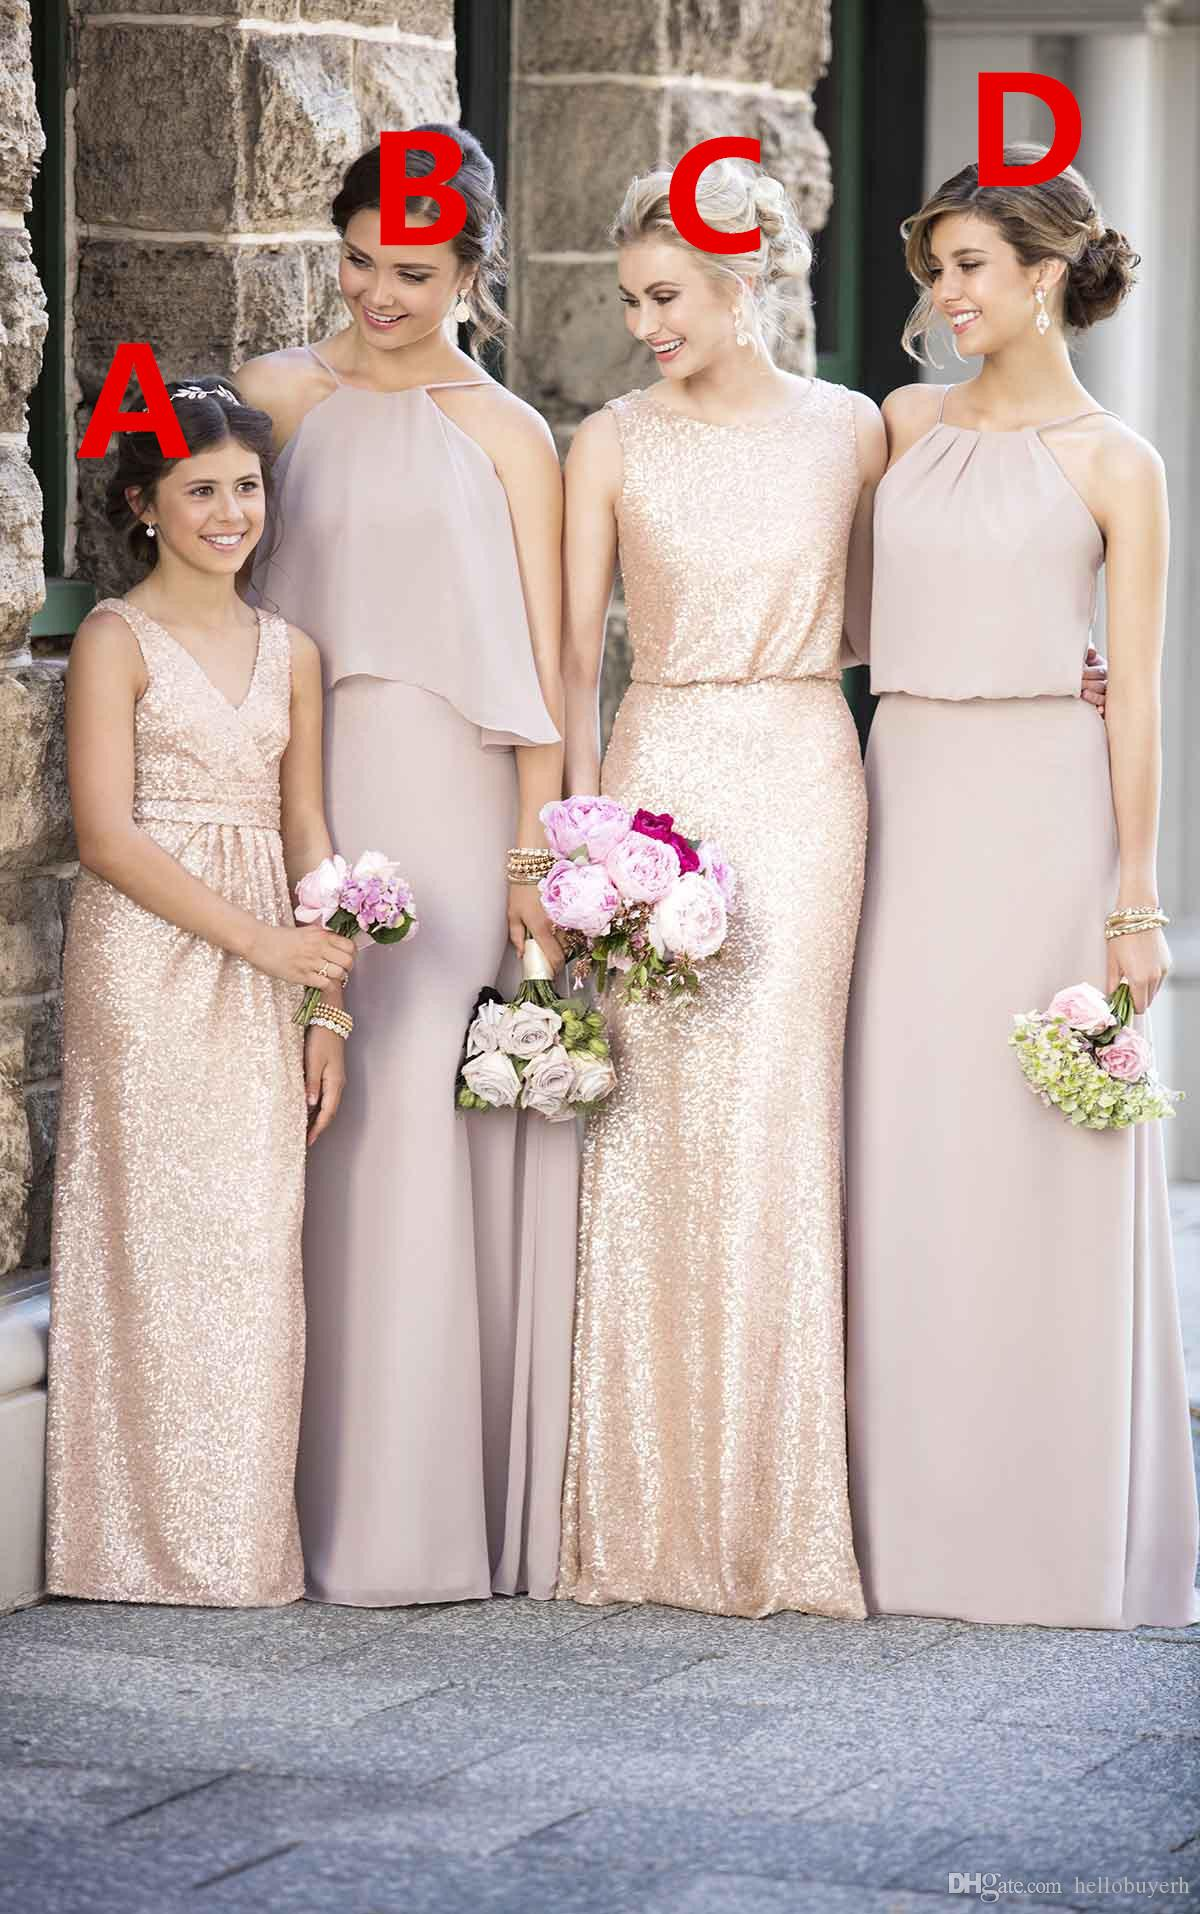 e664bd2605b Sheath Rose Gold Sequins Bridesmaid Dresses Different Styles Same Color  Long Mother Daugther V Neck Flower Girl Dresses Bridesmaid Dresses Cork  Bridesmaid ...